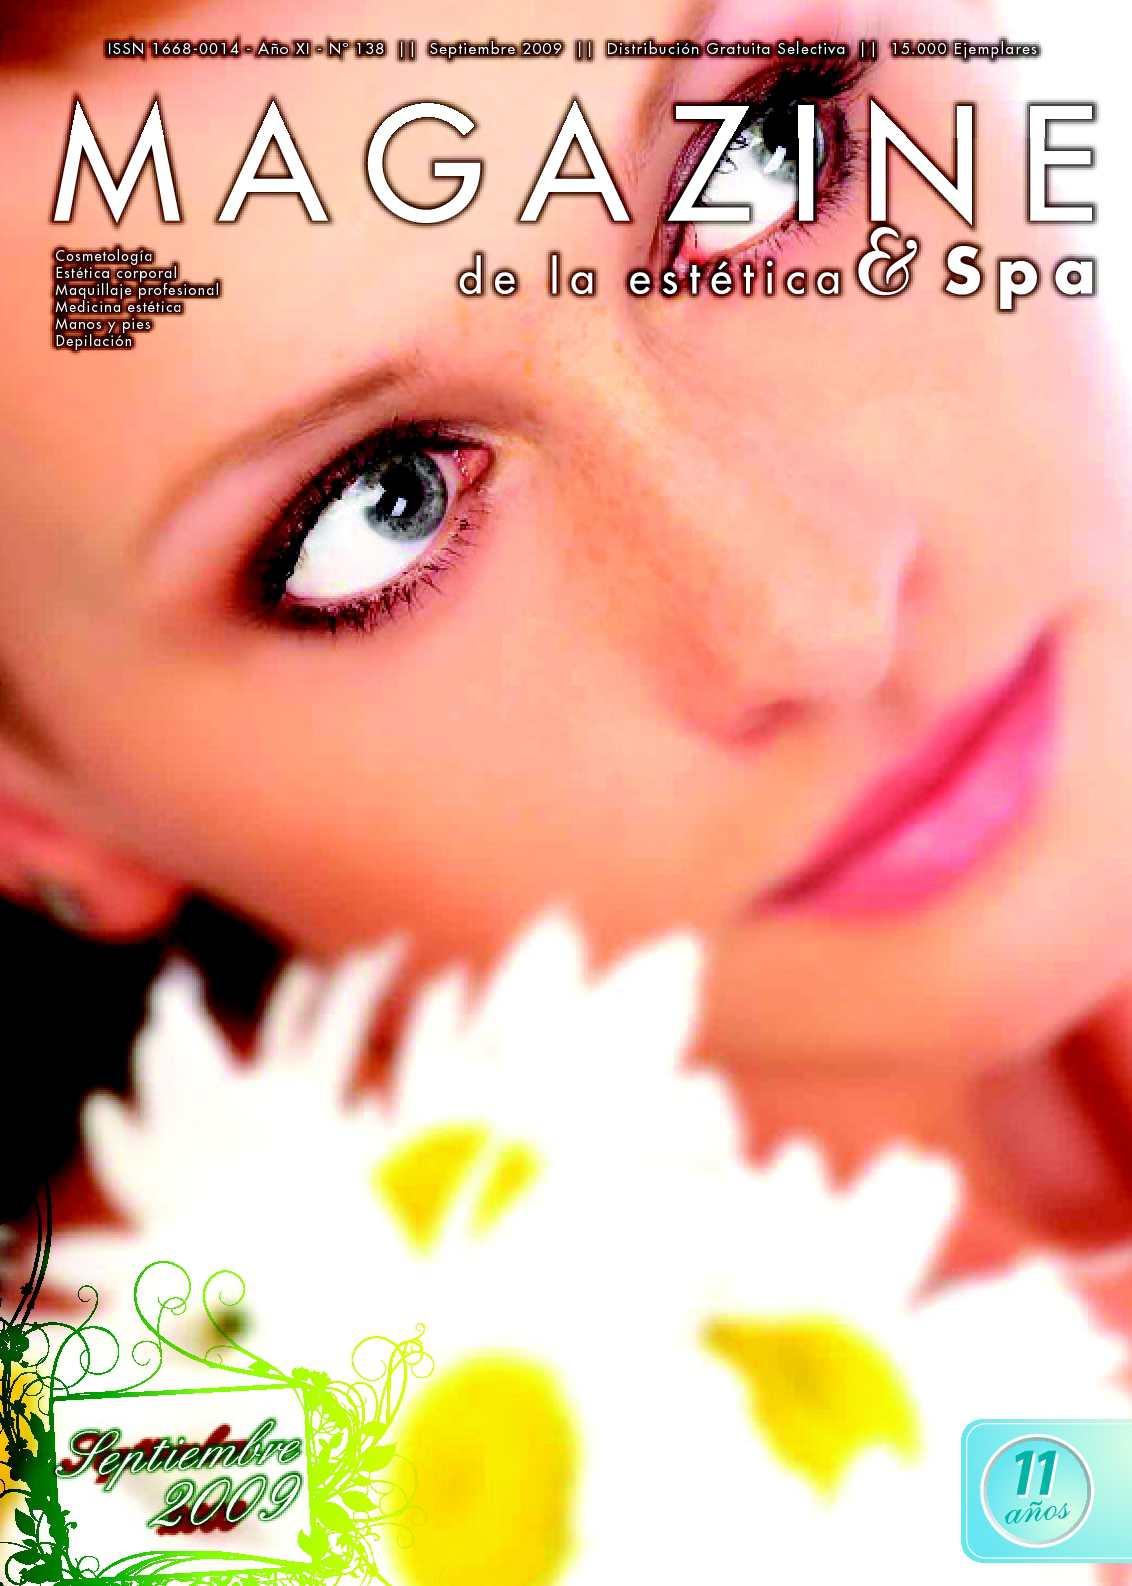 Calaméo - Magazine de la Estética & Spa - Septiembre 2009